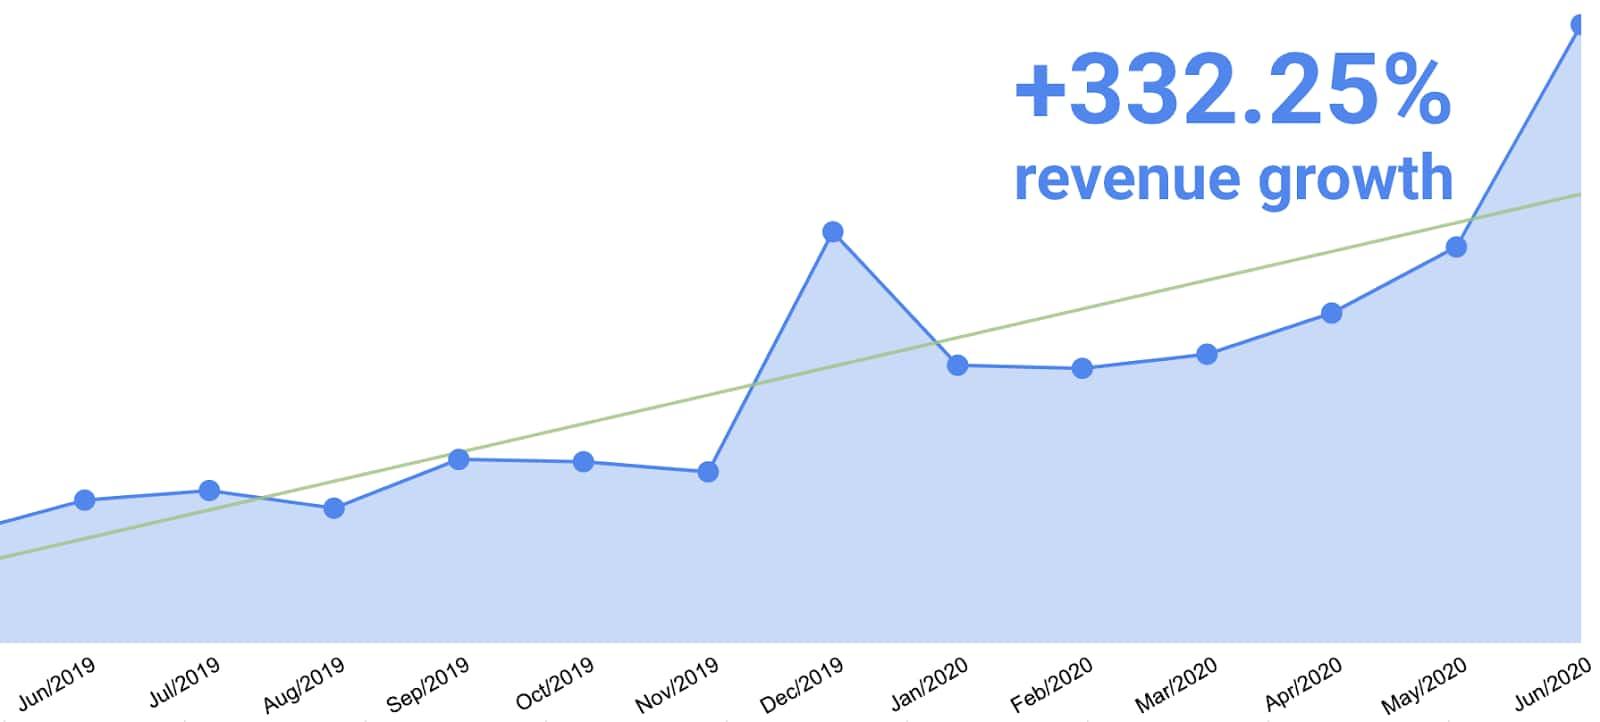 iDenfy's revenue grew by 332.25% from June 2019-June 2020